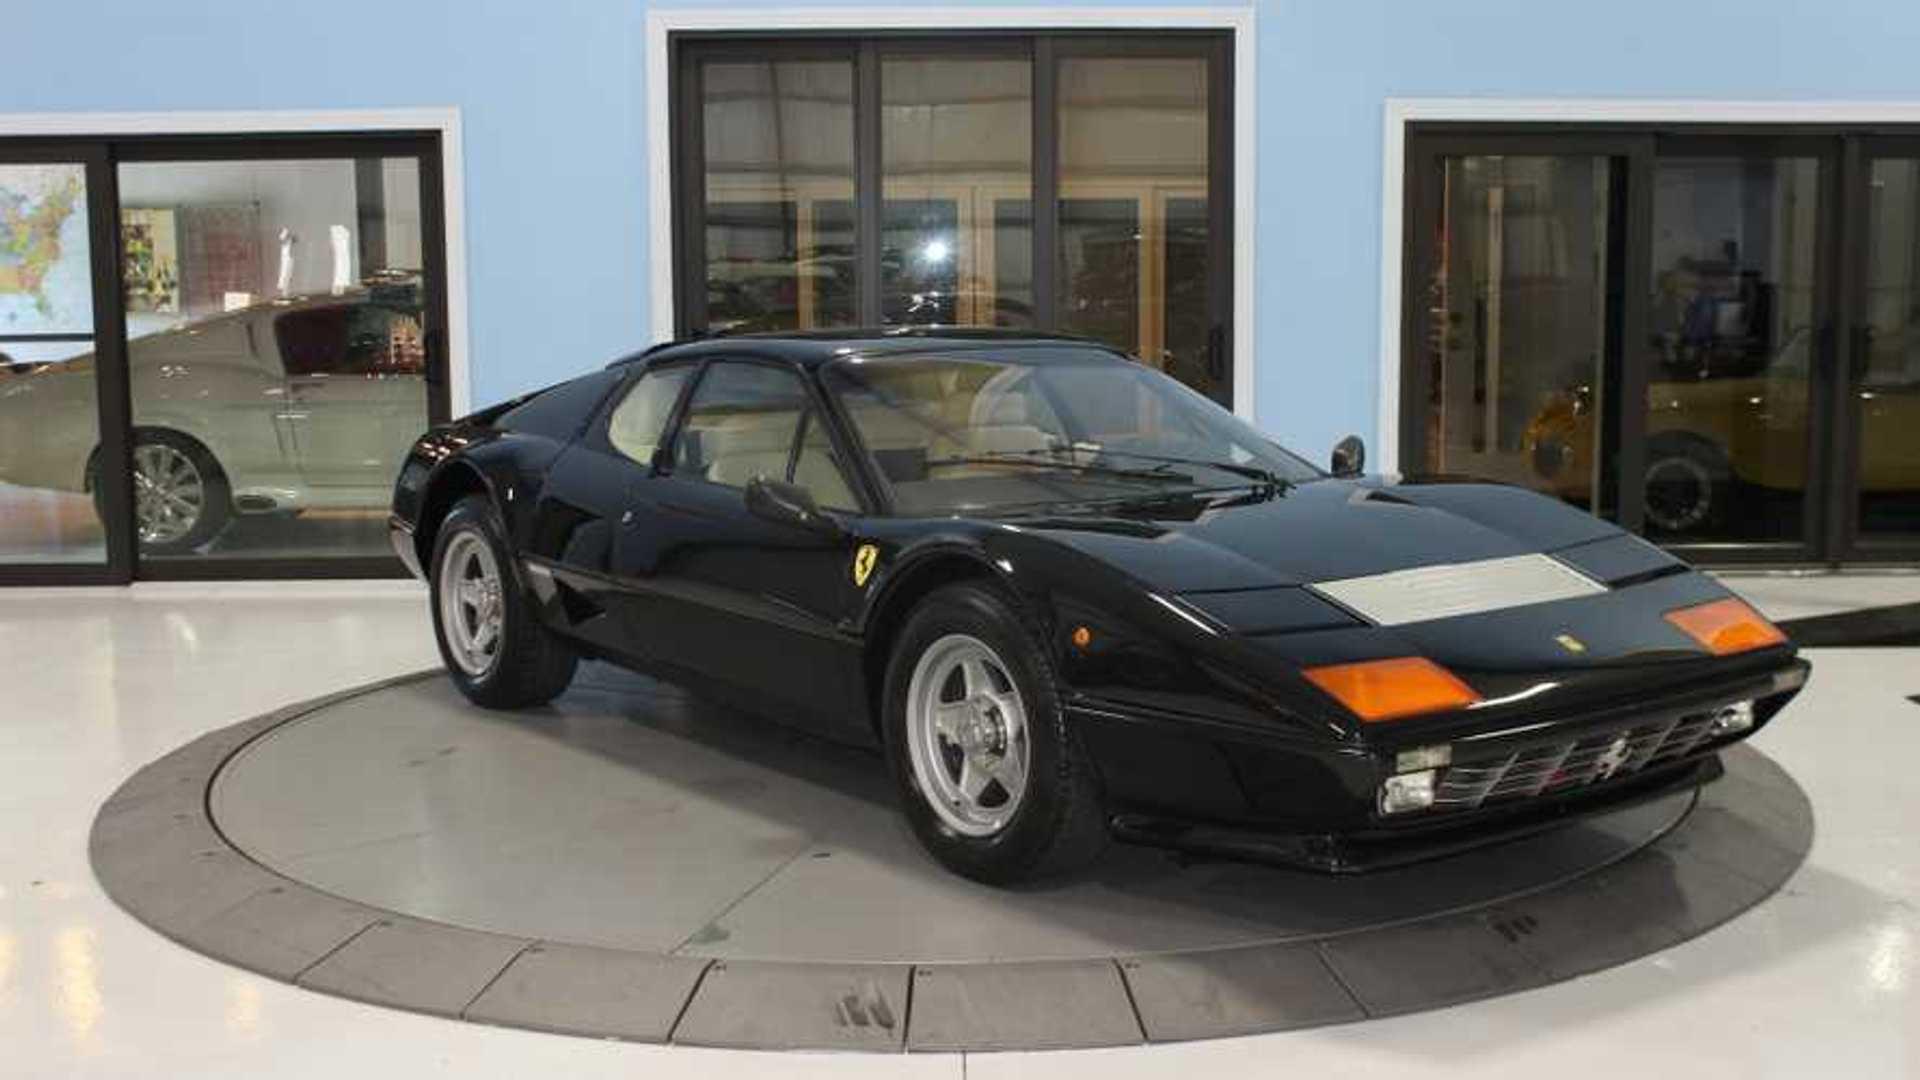 This 1983 Ferrari Bb512 Is A Flat 12 Powered Beauty Motorious